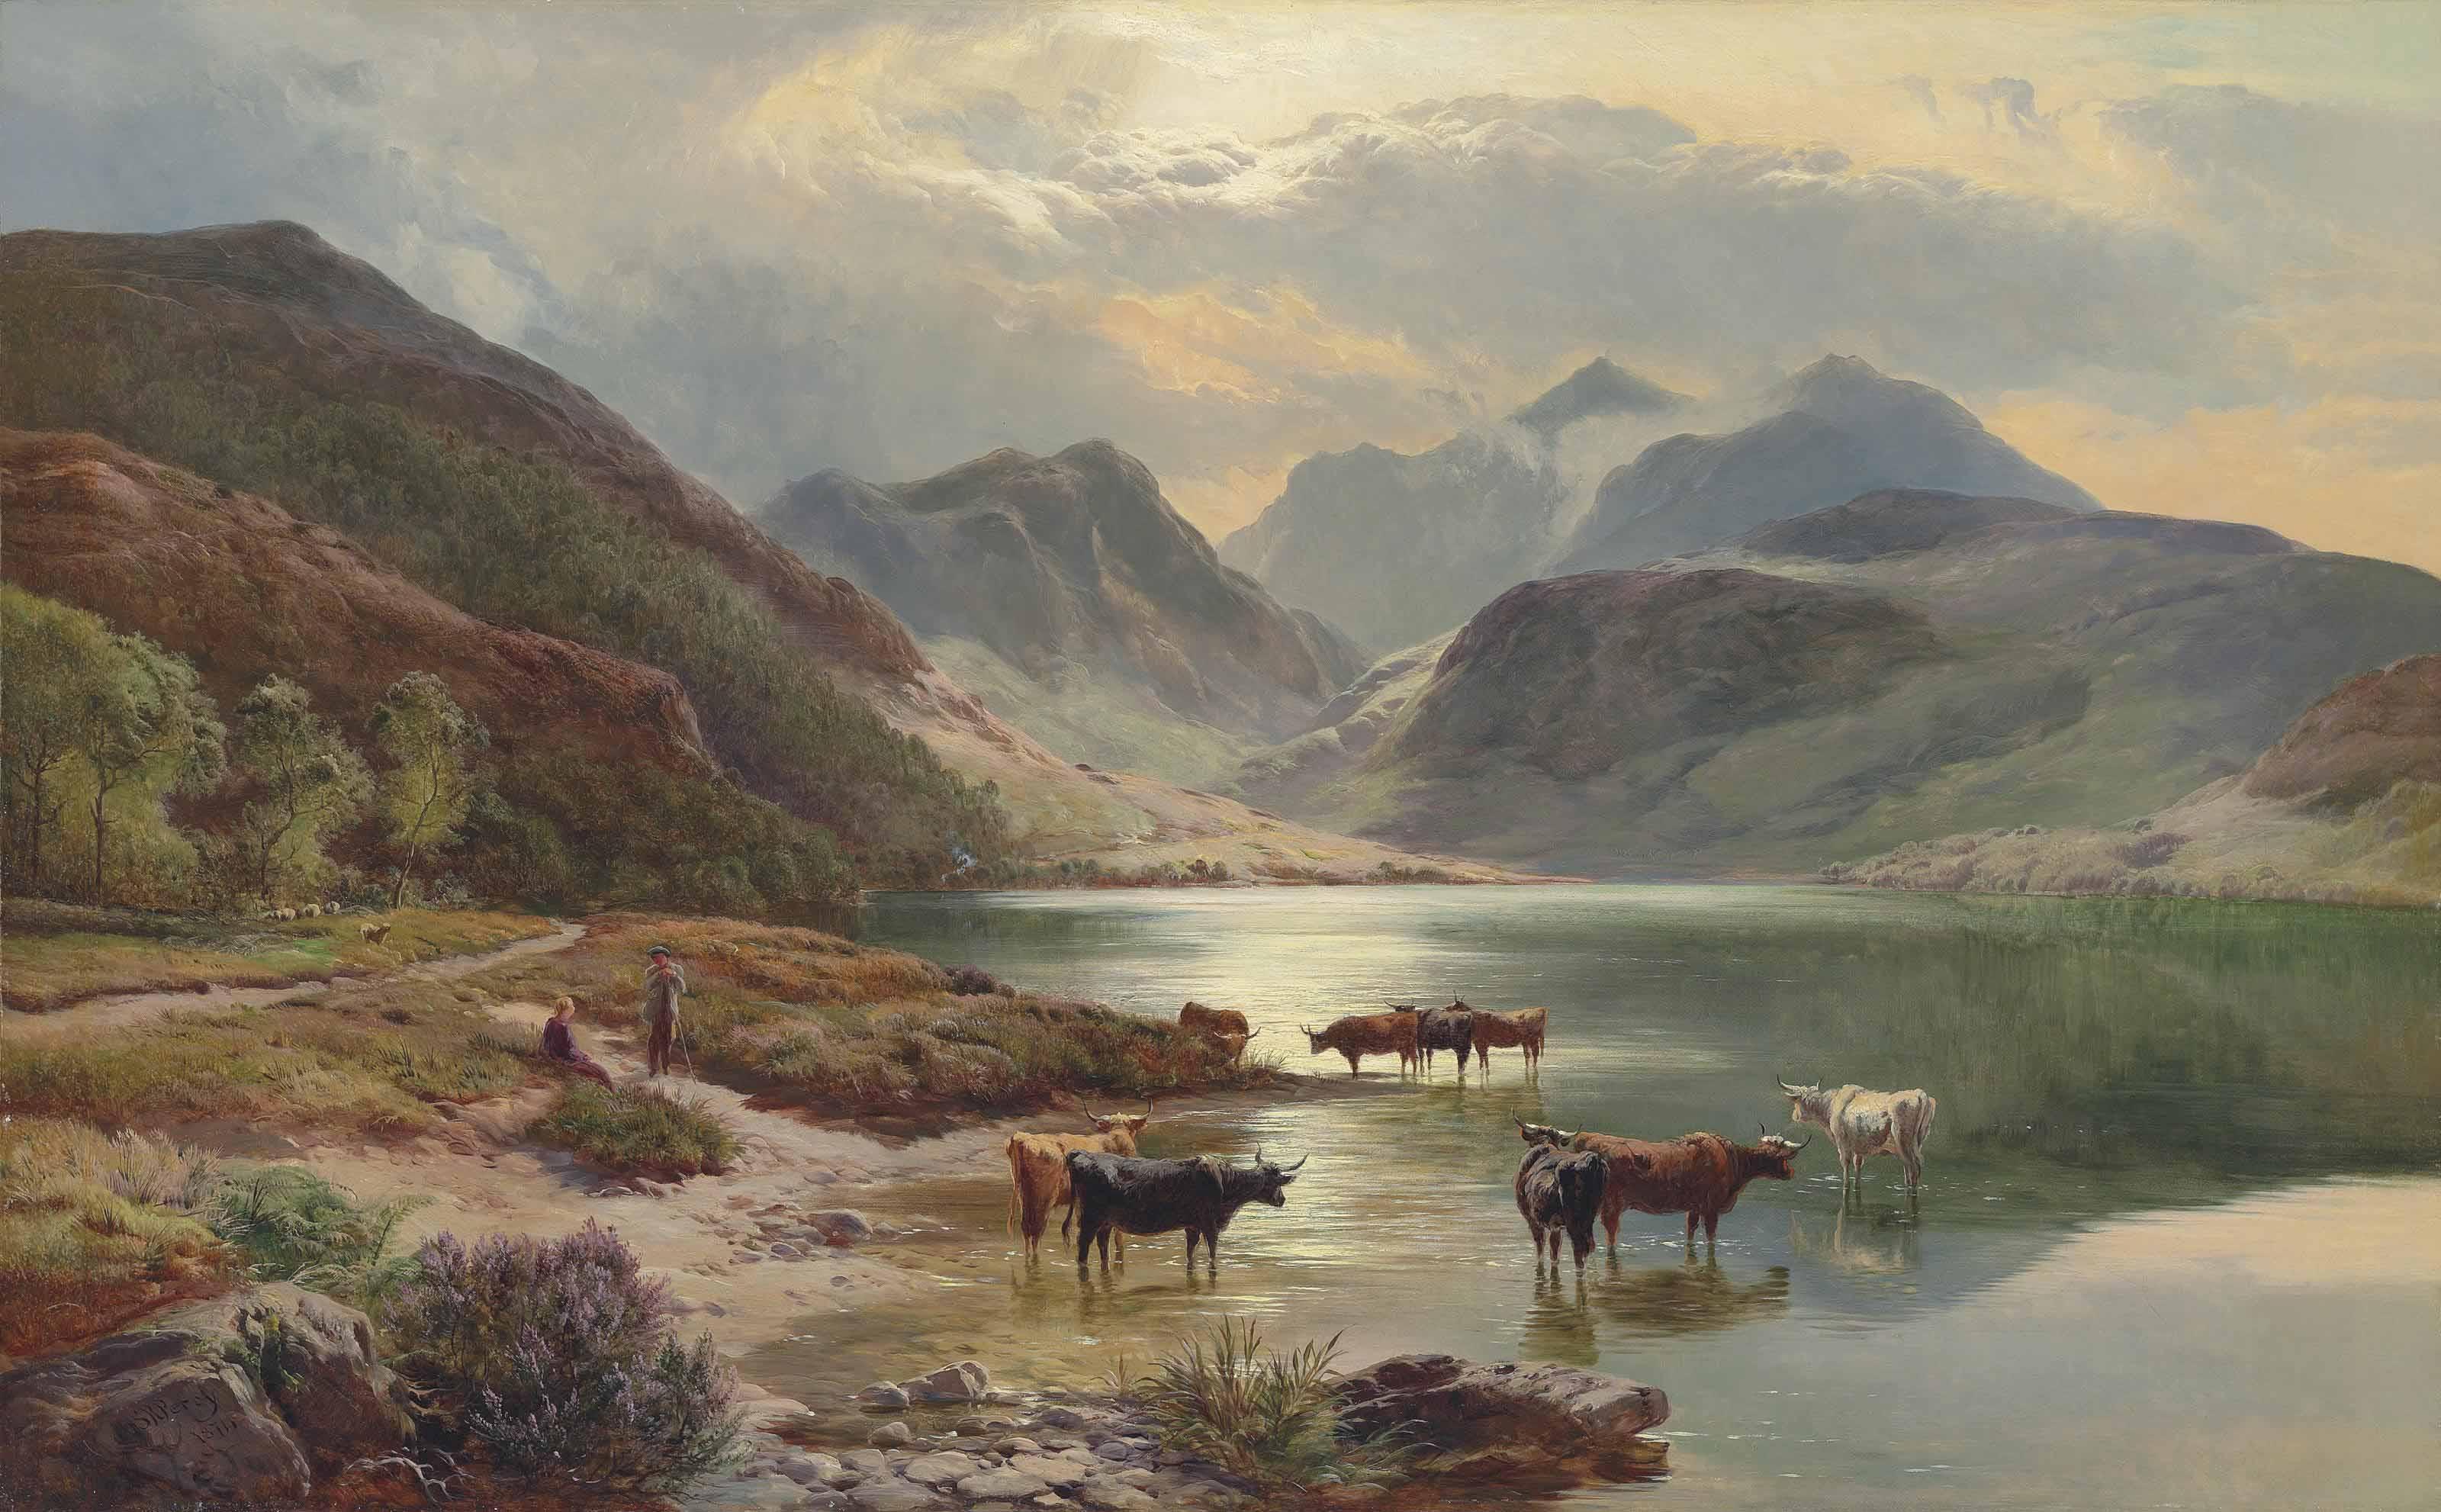 Glencoe from Loch Leven, Scotland